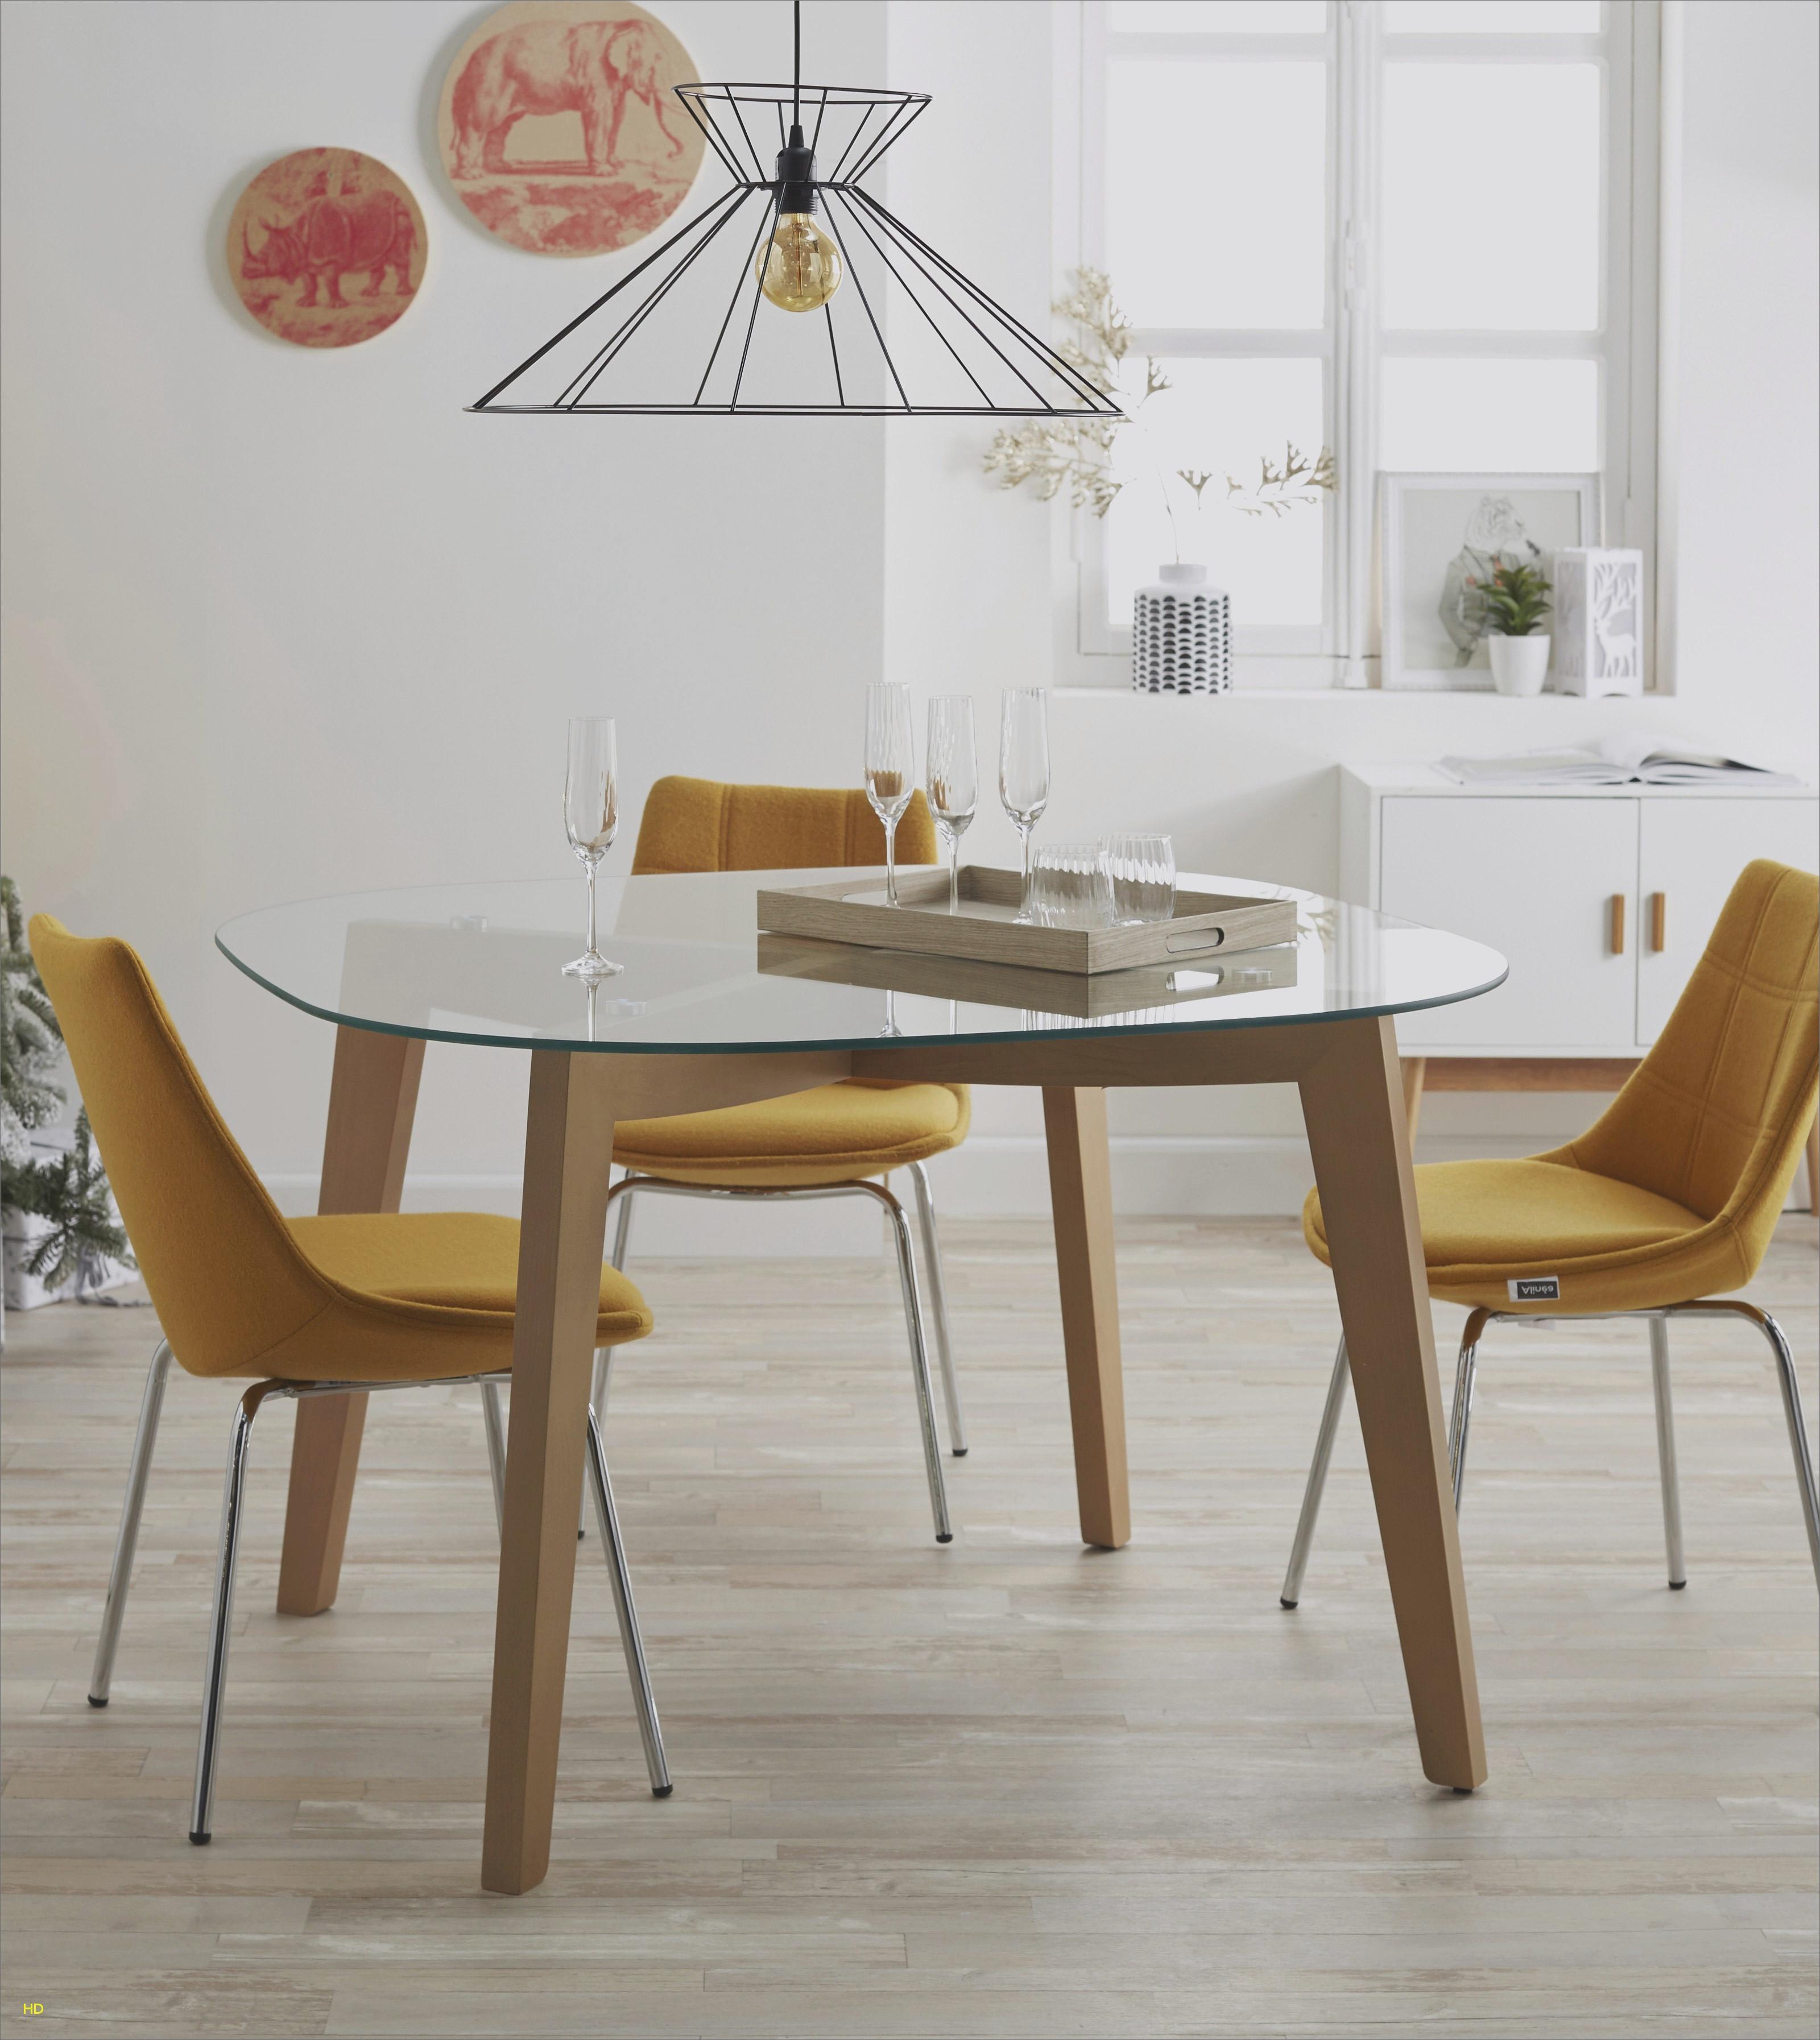 Catalogue Ikea Salle De Bain Nouveau Images 20 Beau Tabouret De Bain Ikea Bain